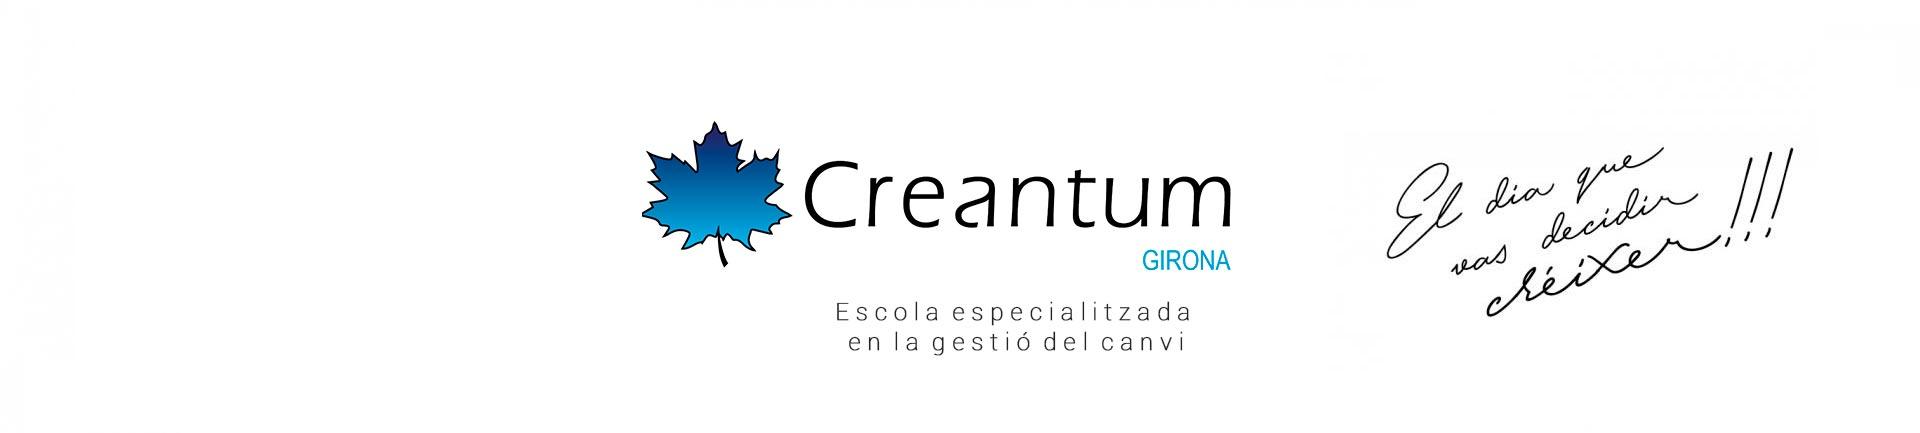 INICI-WEB-CREANTUM-GIRONA-1